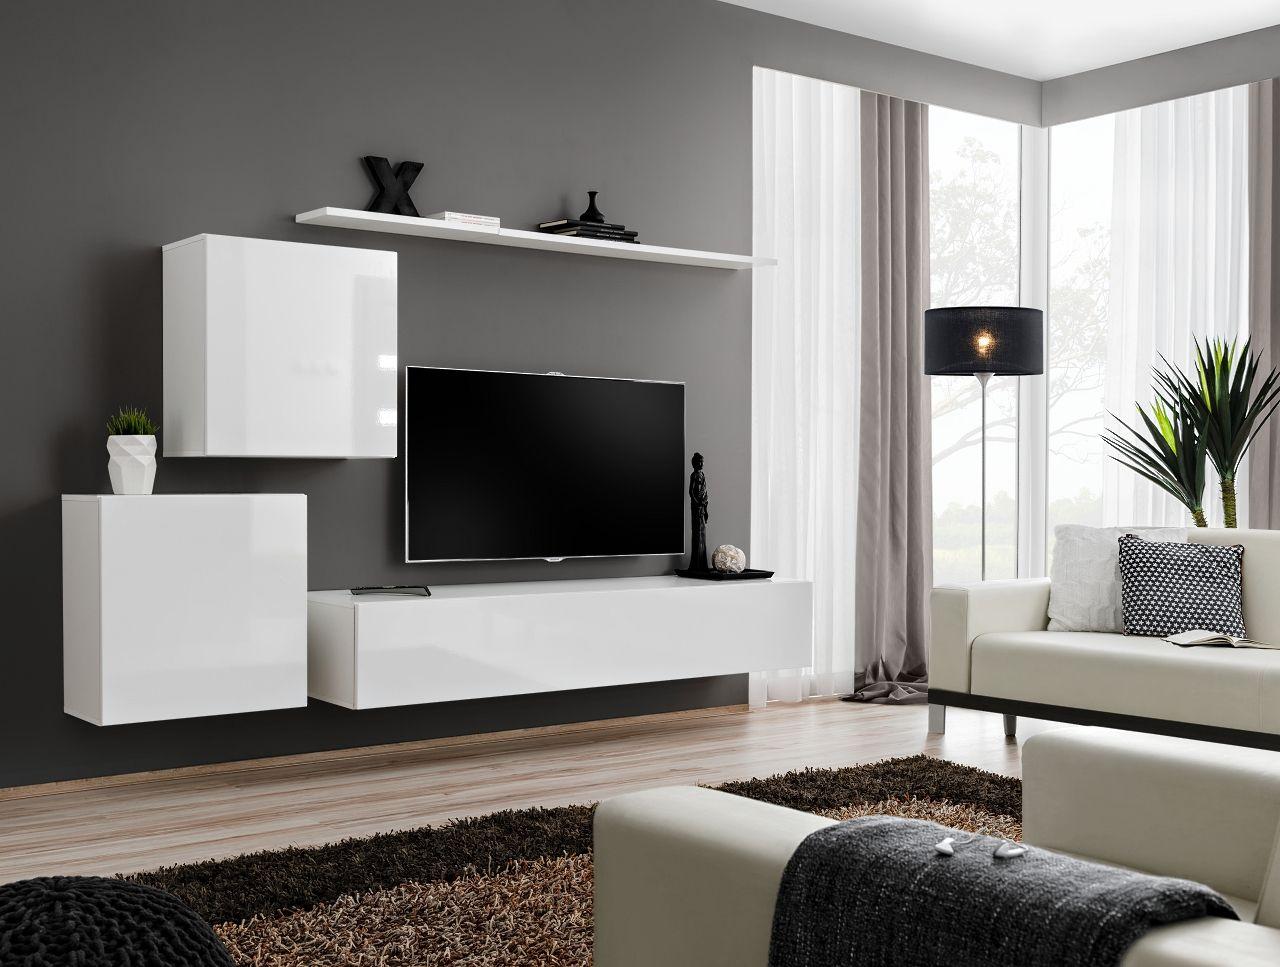 Tv Kast Wit Modern.Shift 5 Tv Meubel Wit Moderne Tv Muur Woonkamer Muren En Tv